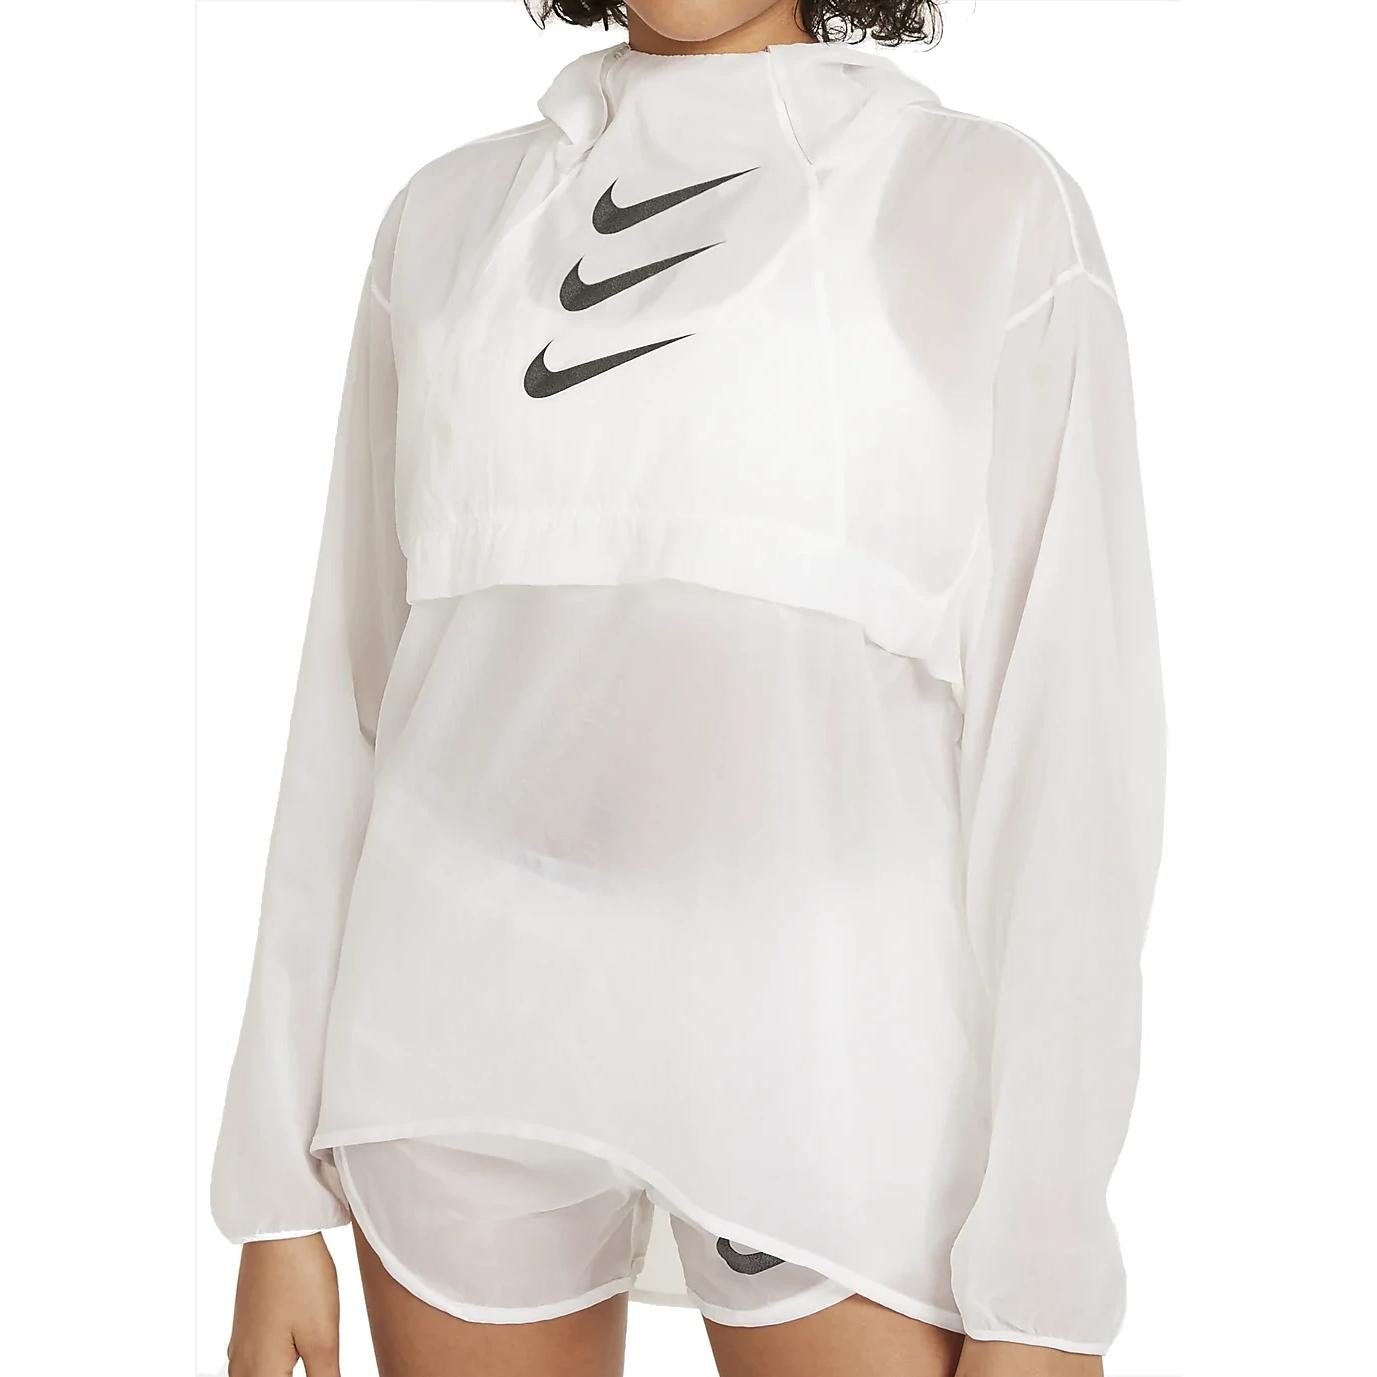 Nike Run Division Packable Damen-Laufjacke - white/black DA1276-100